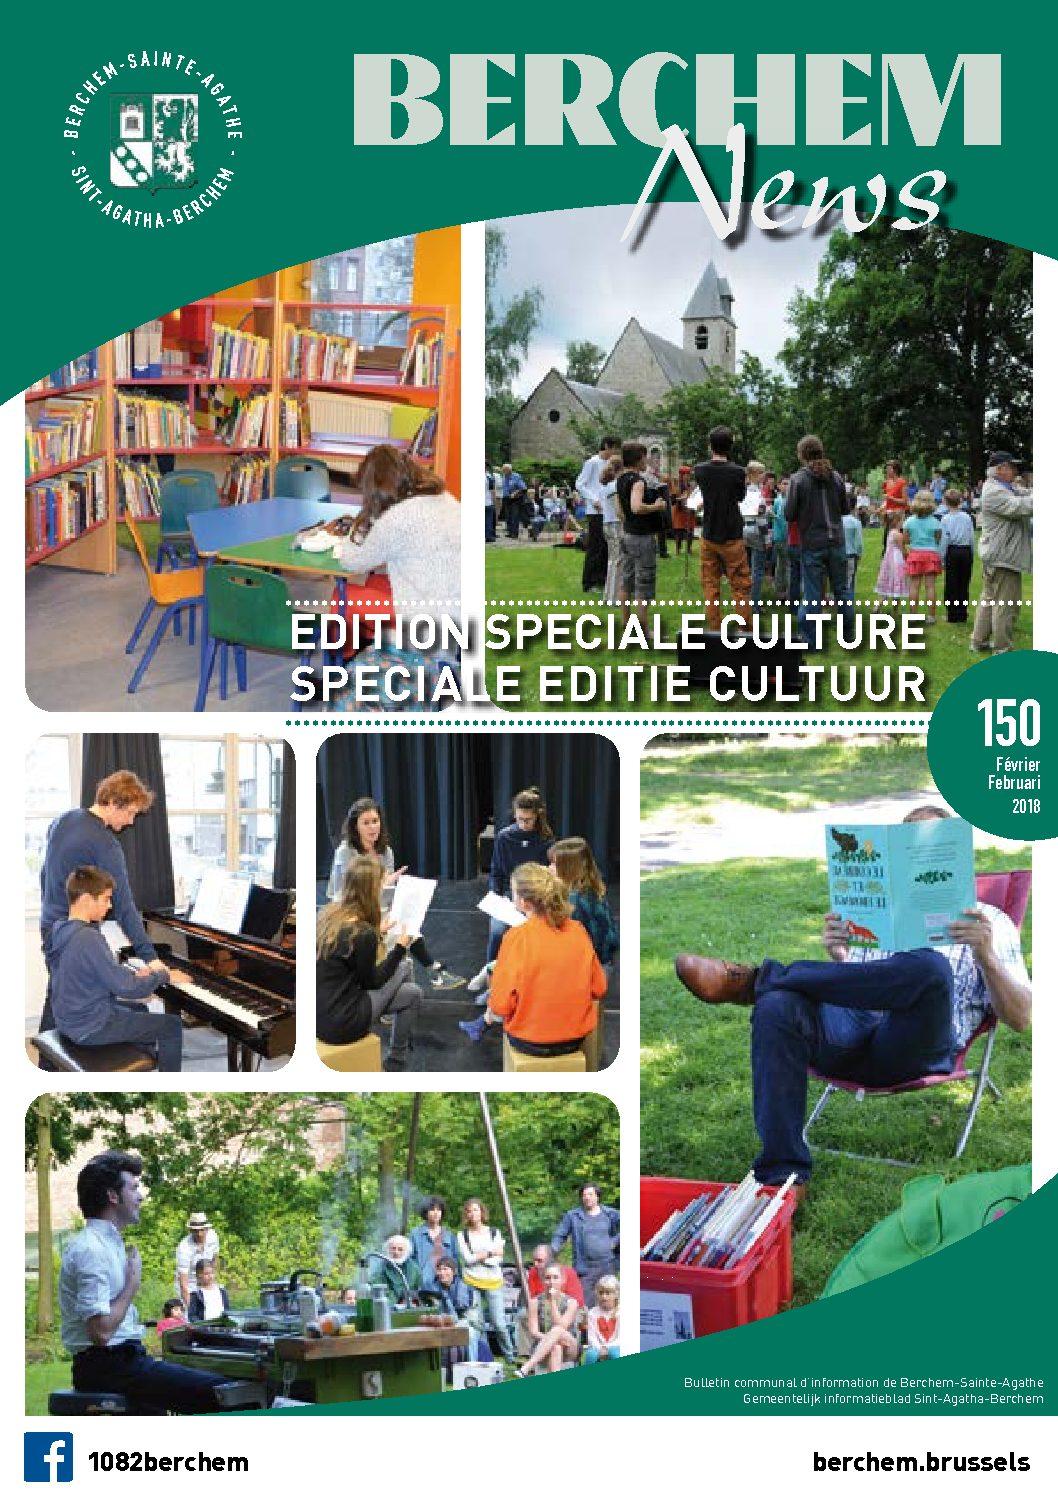 Edition Speciale Culture Speciale Editie Cultuur